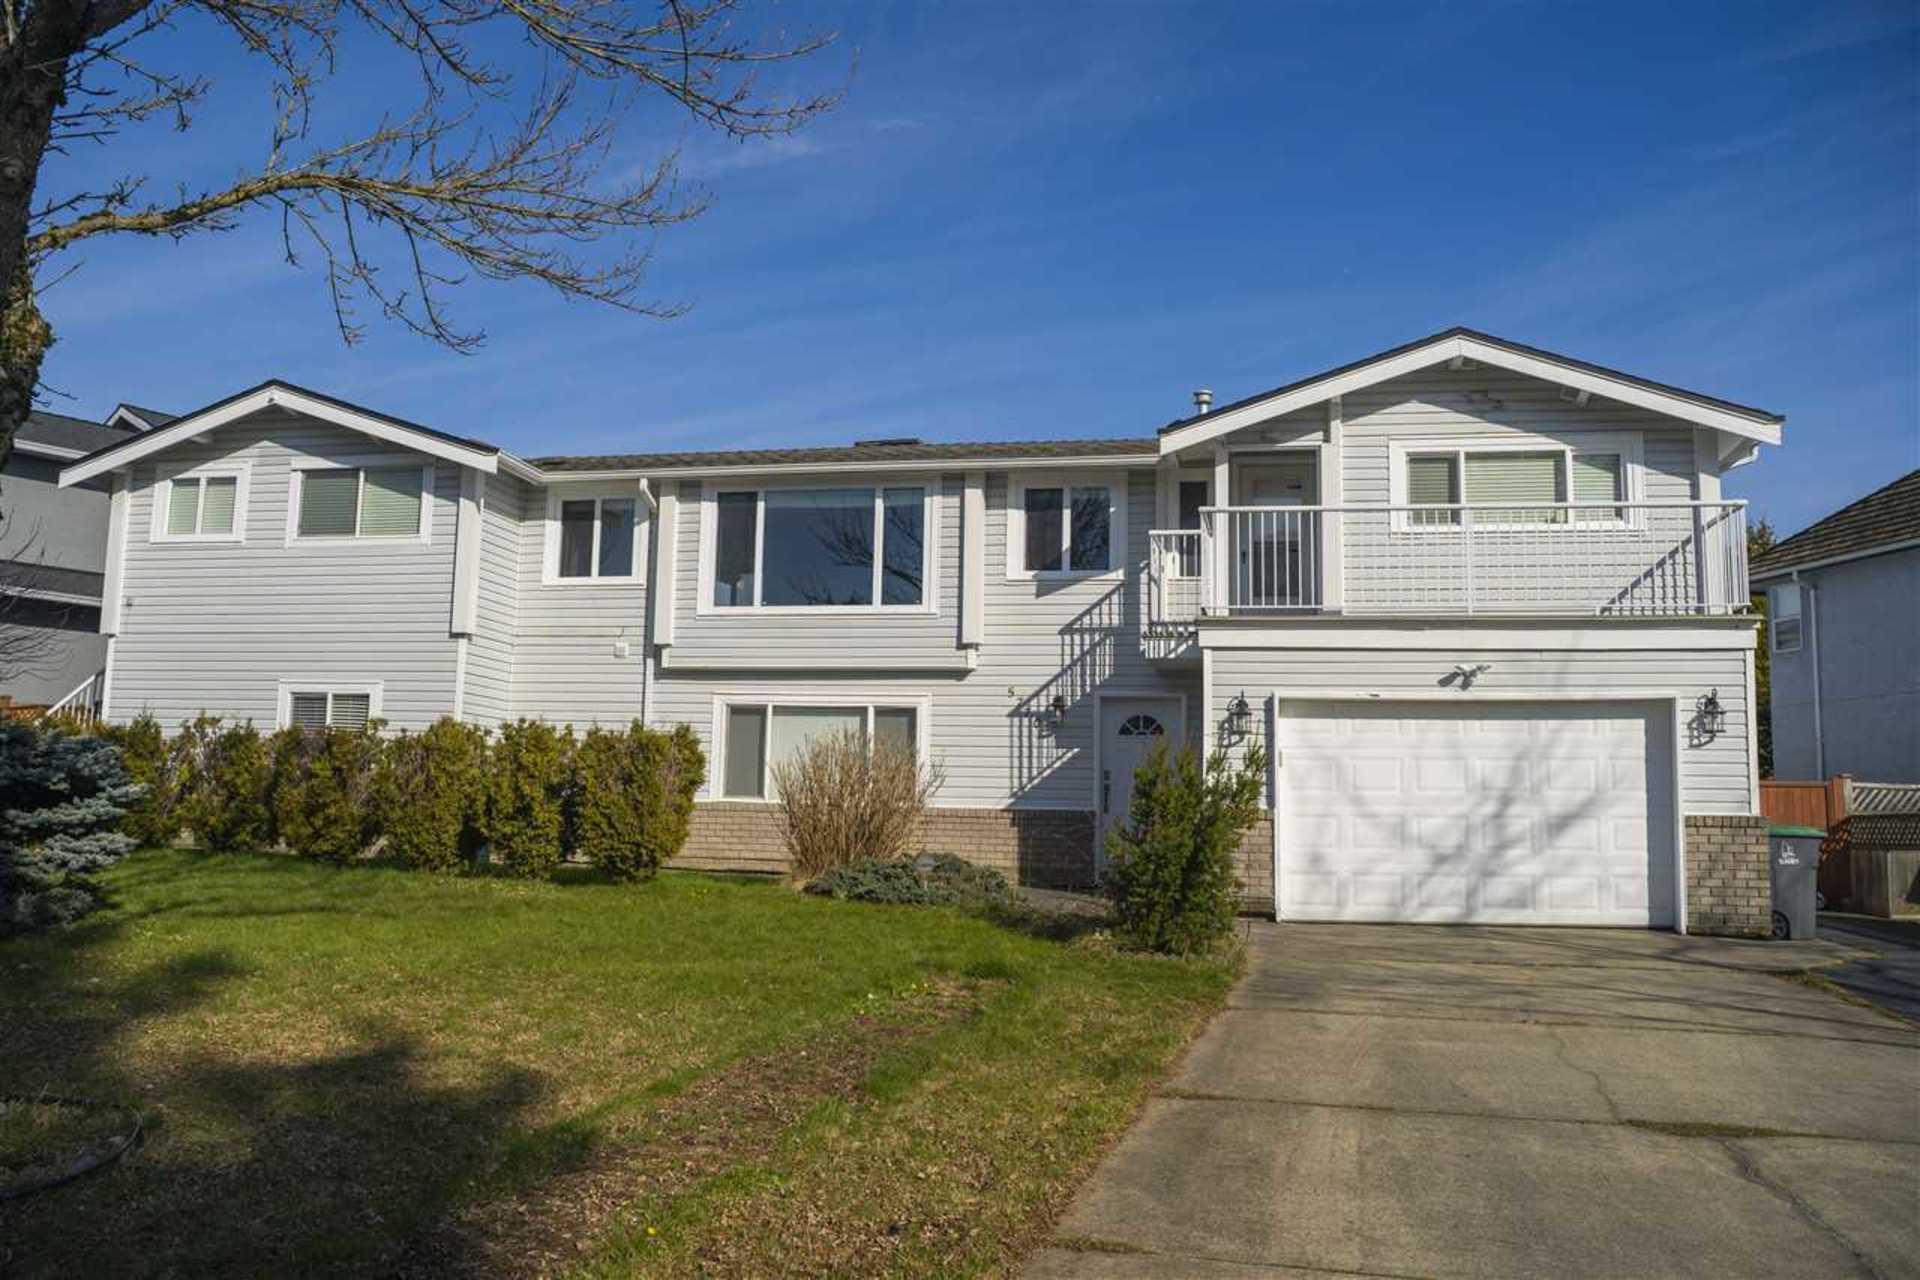 5770-185-street-cloverdale-bc-cloverdale-01 at 5770 185 Street, Cloverdale BC, Cloverdale